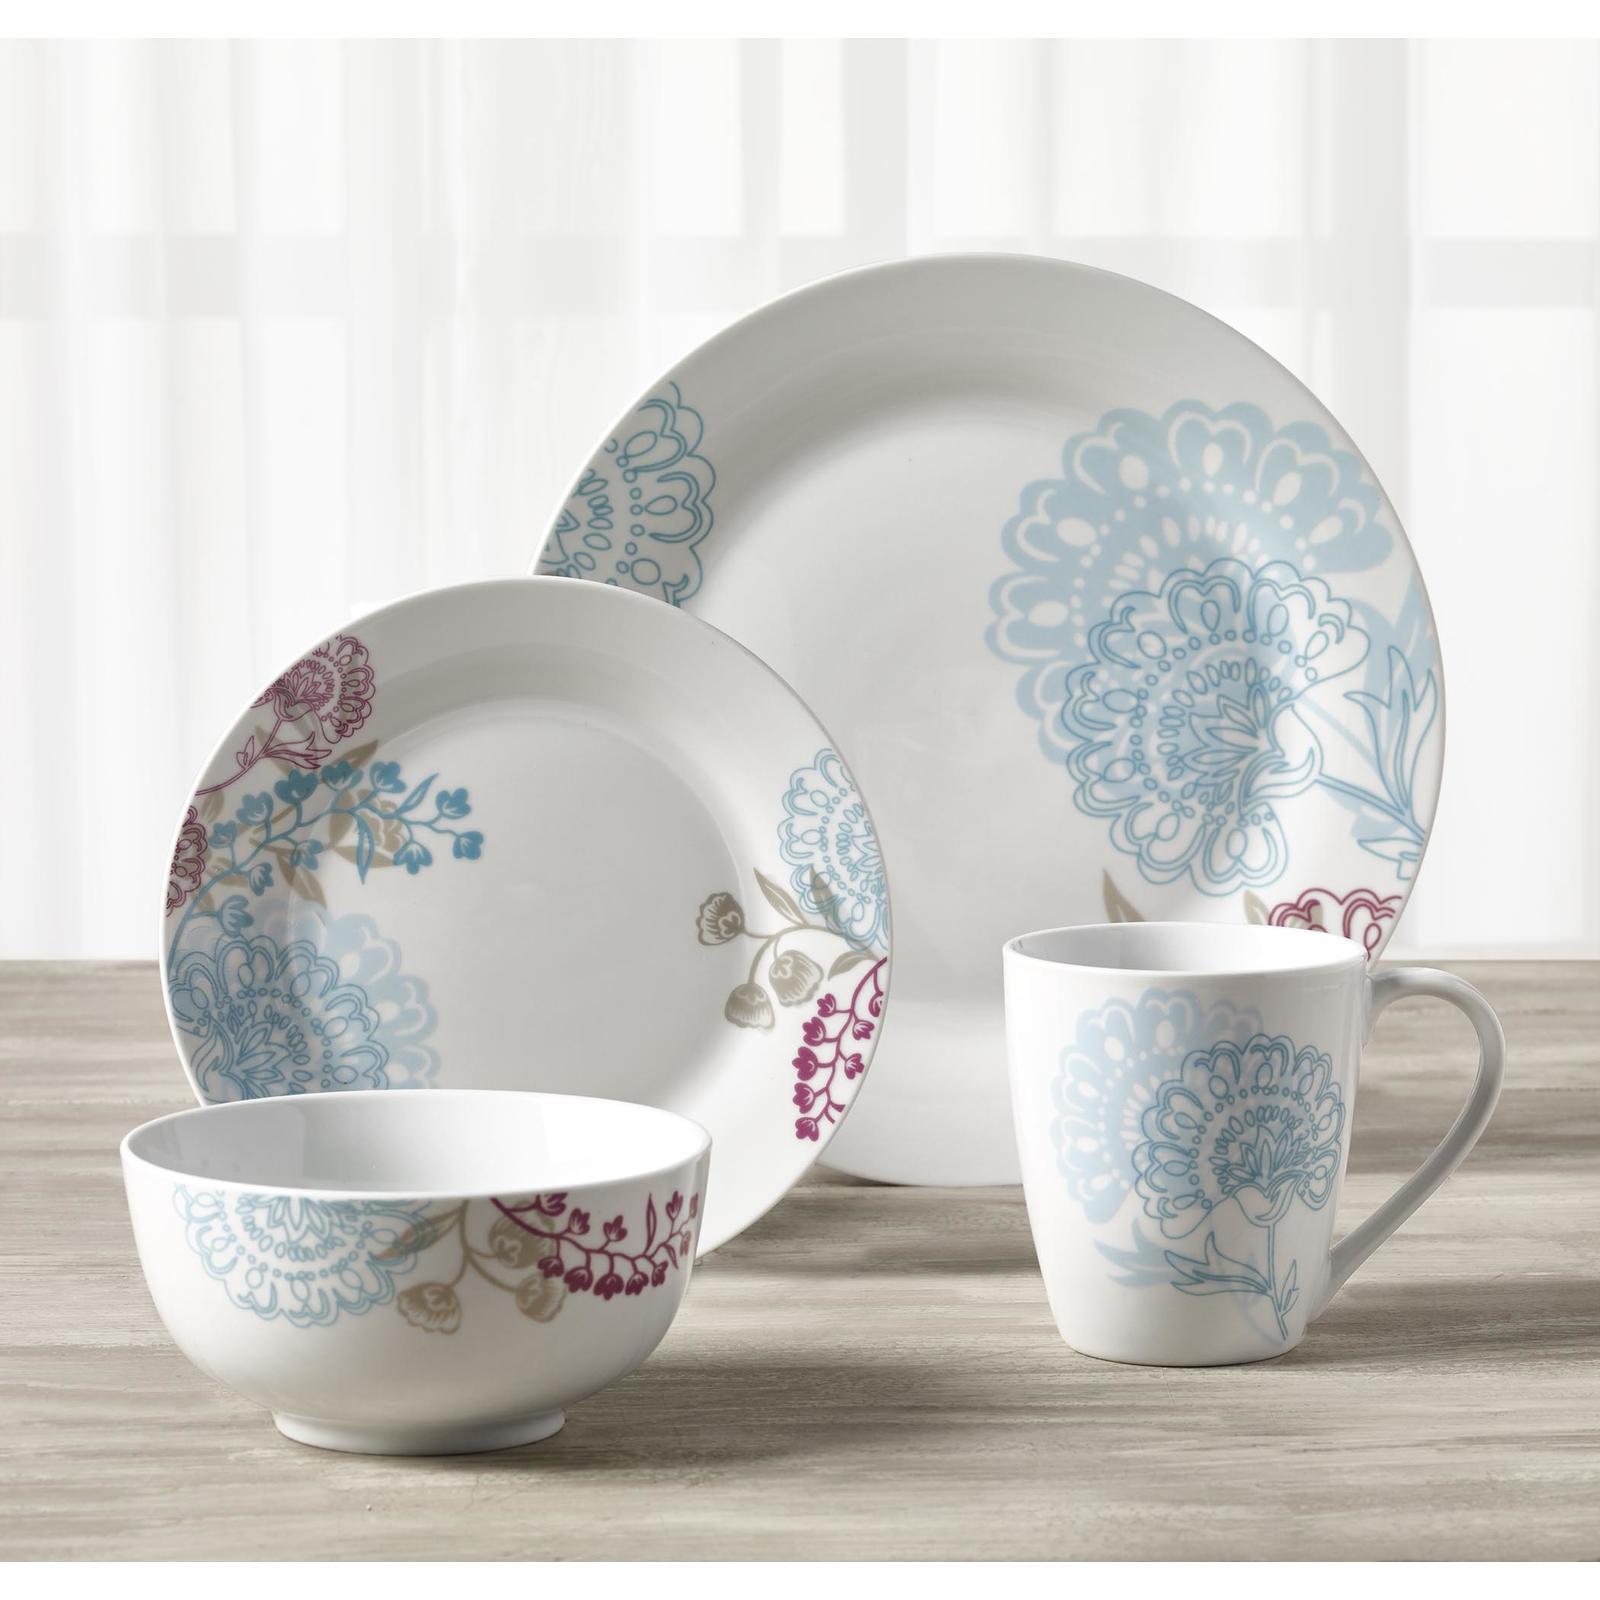 Tabletops Unlimited 16-pc. Grace Dinnerware Set